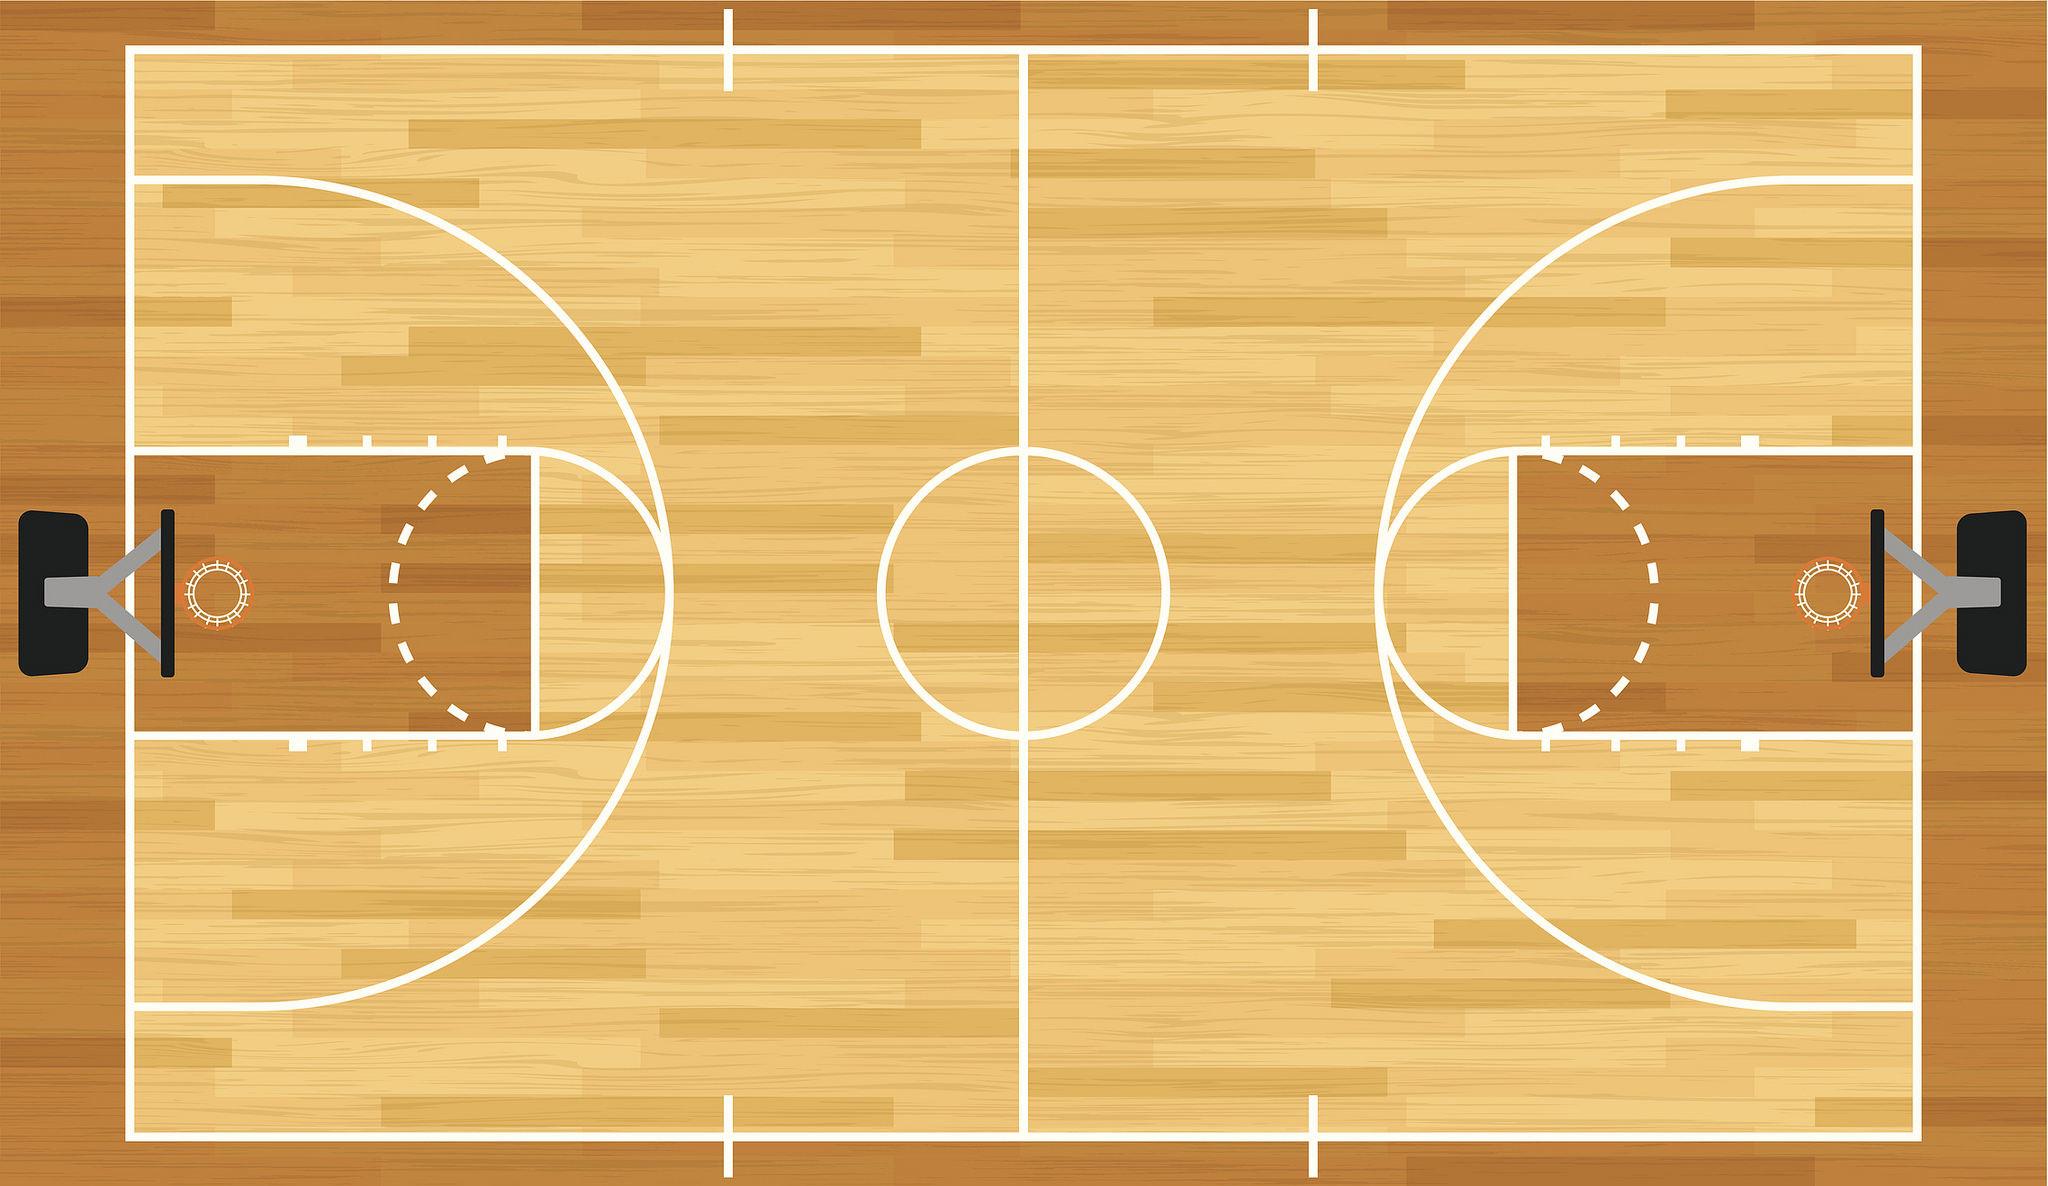 juego baloncesto dinamismo datos